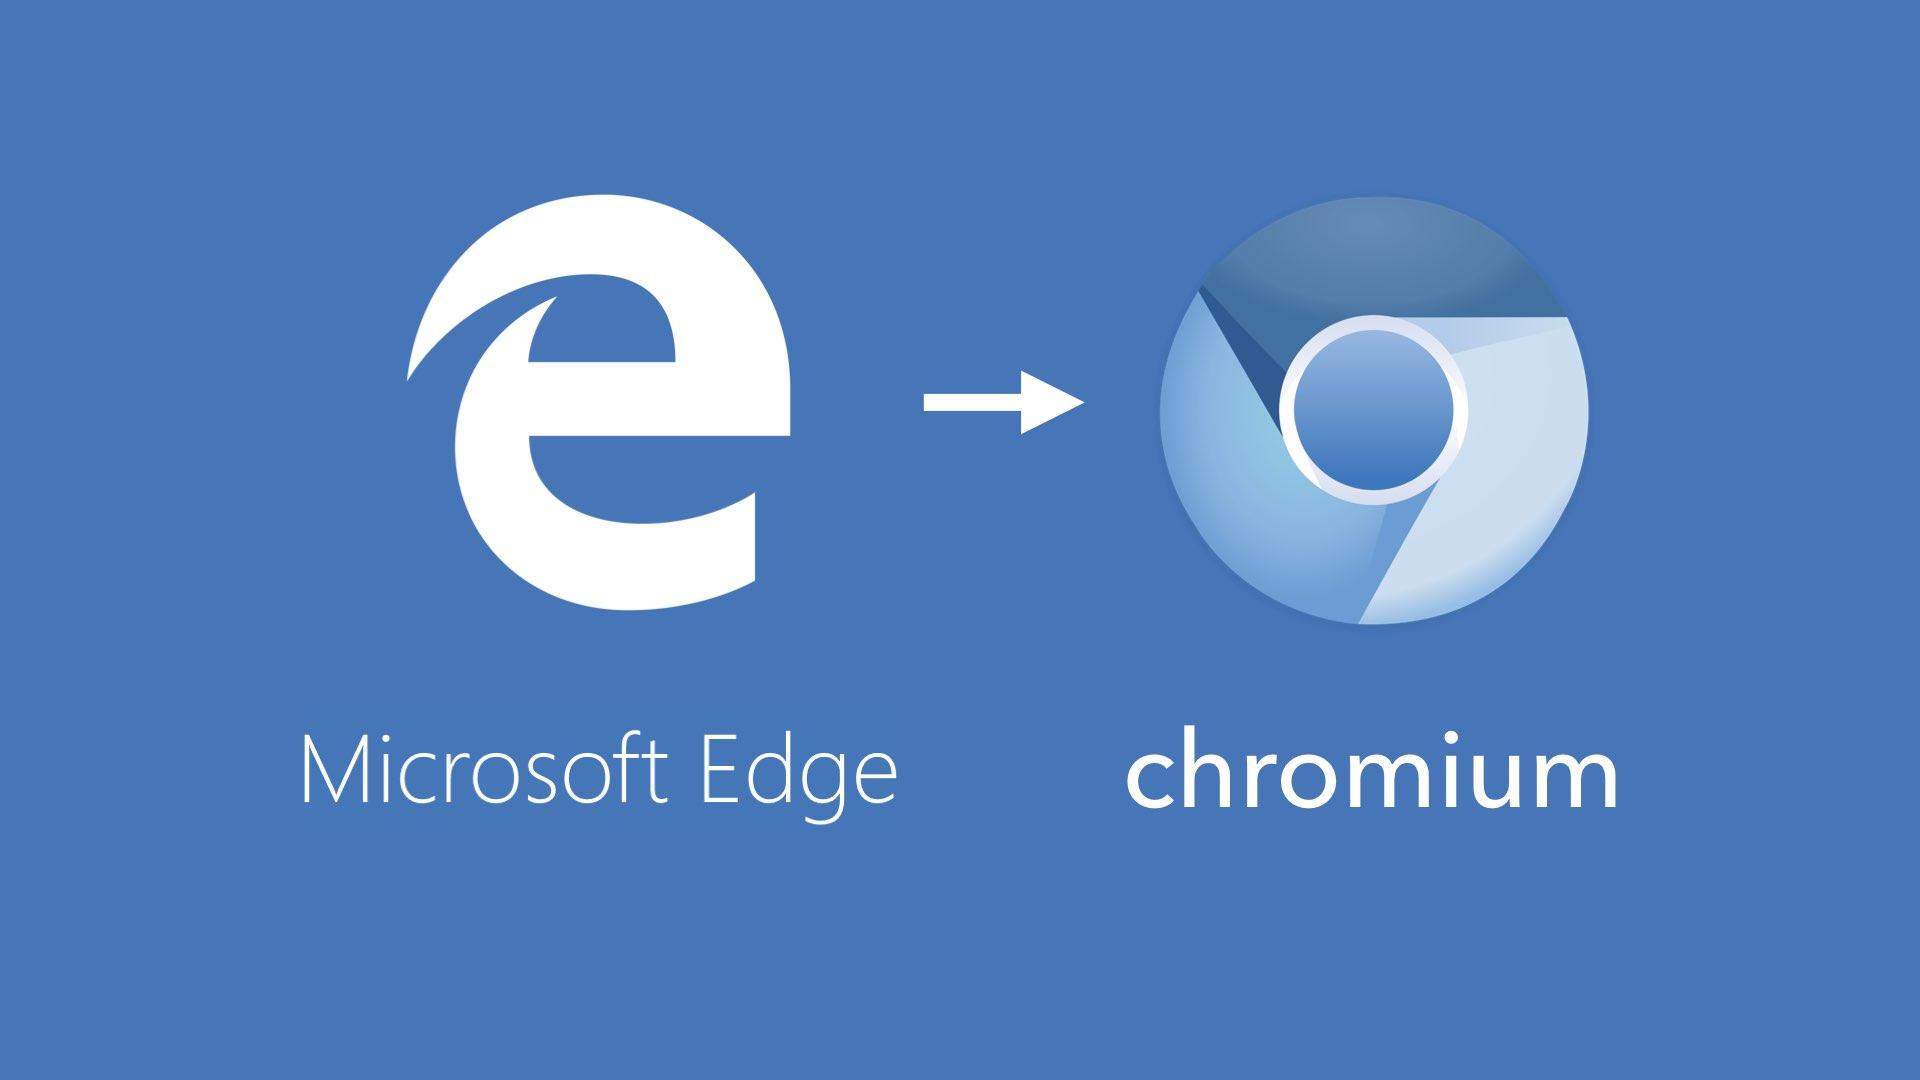 Microsoft Edge moves to Chromium in 2019 · Blog